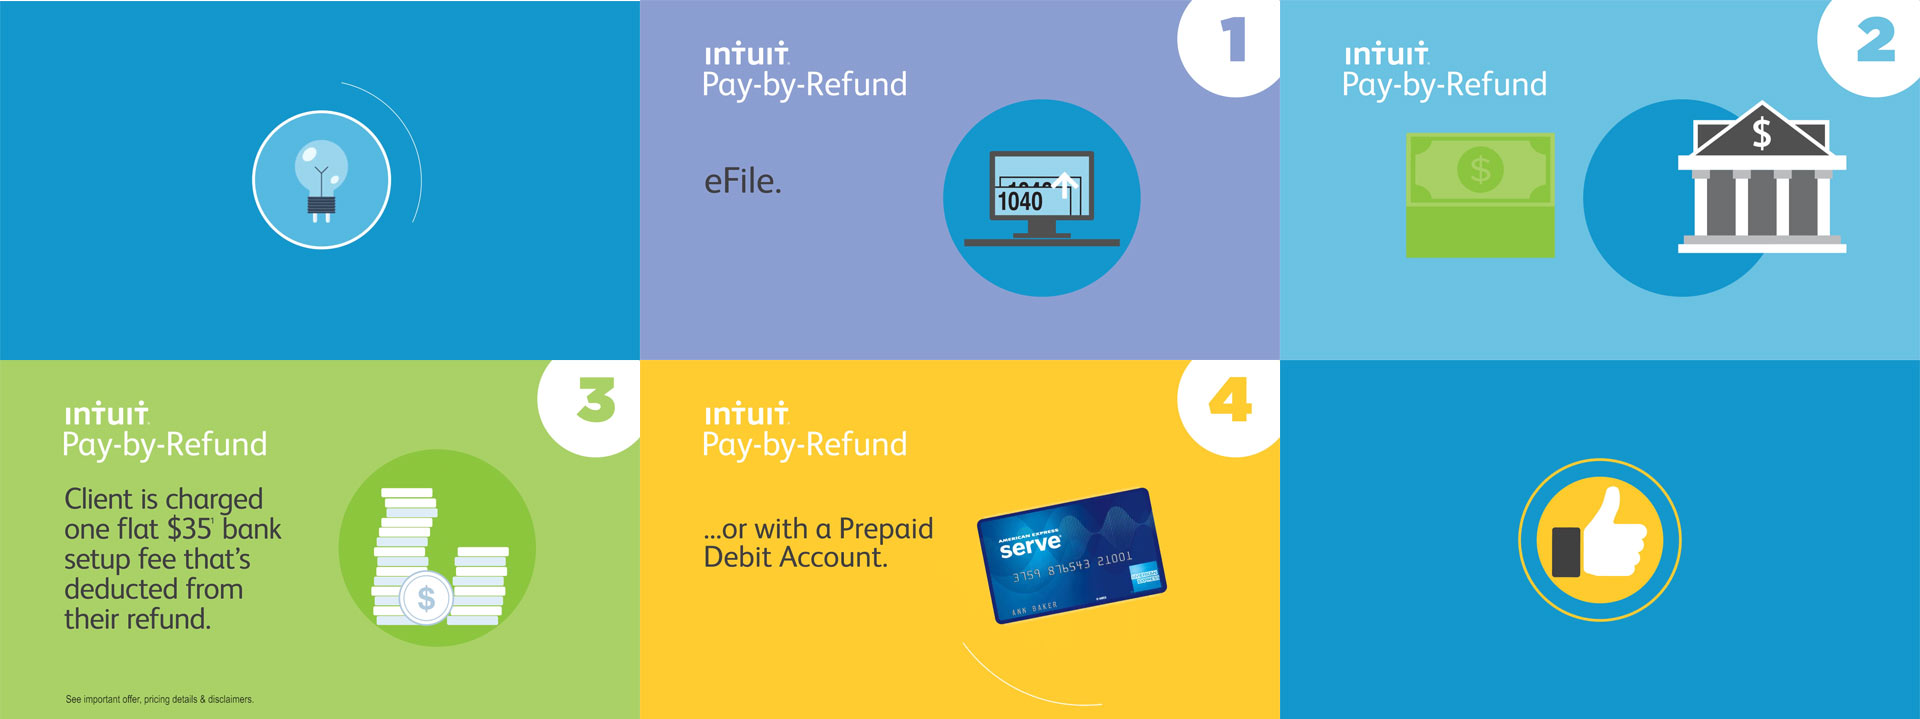 Intuit-PaybyRefund.jpg